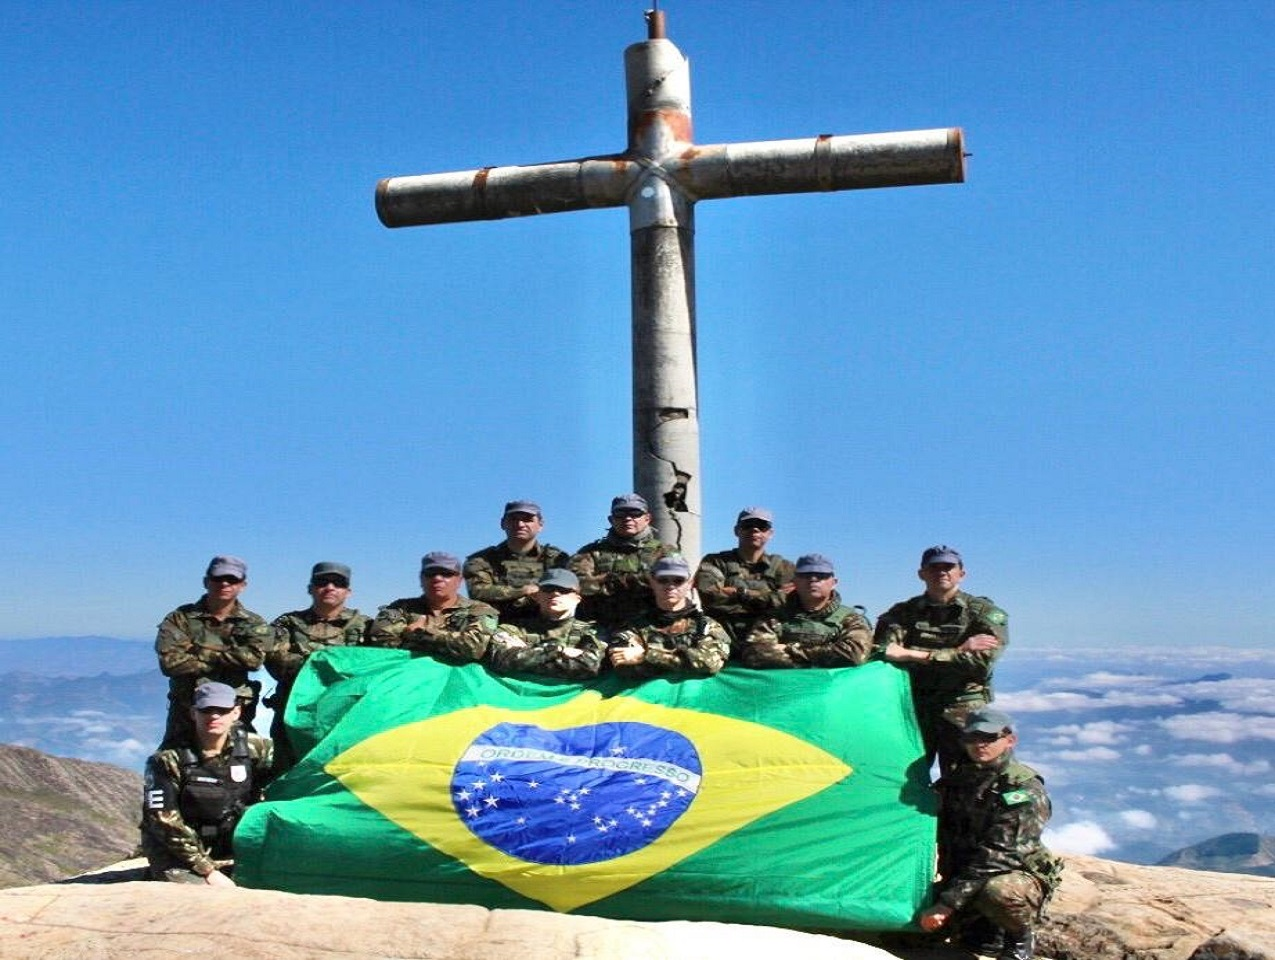 Militares escalam o Pico da Bandeira